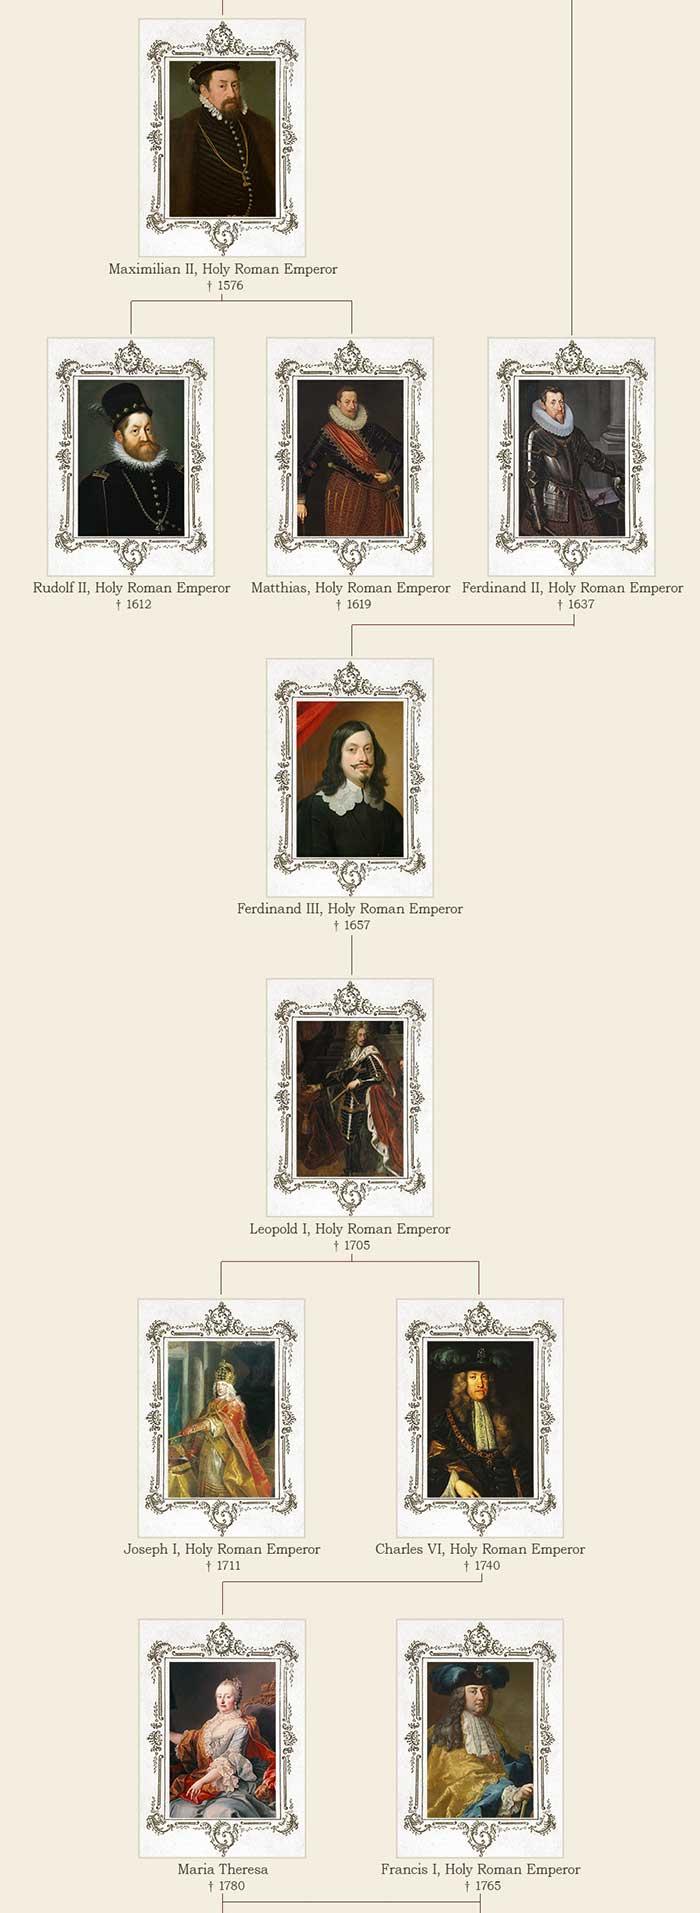 The Habsburg family tree